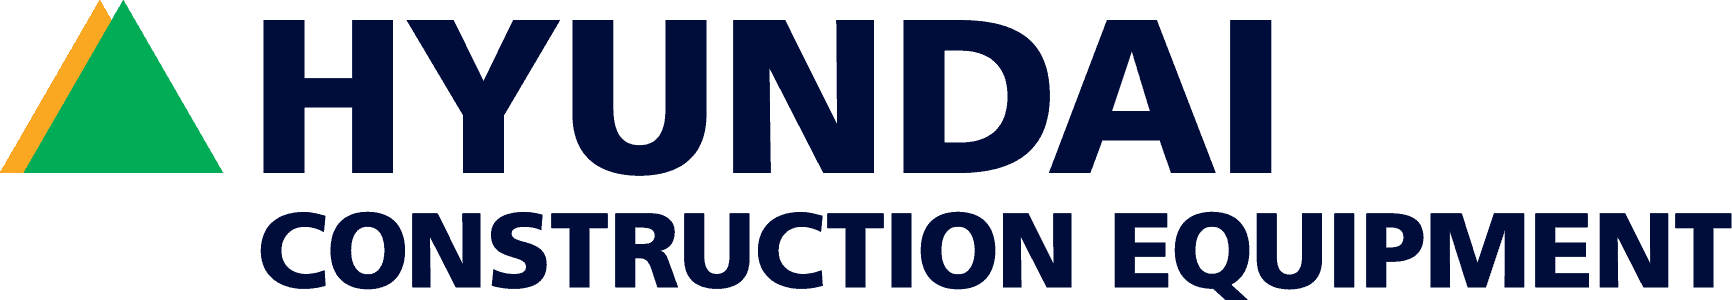 Hyundai Construction Equipment Americas Tracey Road Hyundai Equipment for sale syracuse ny